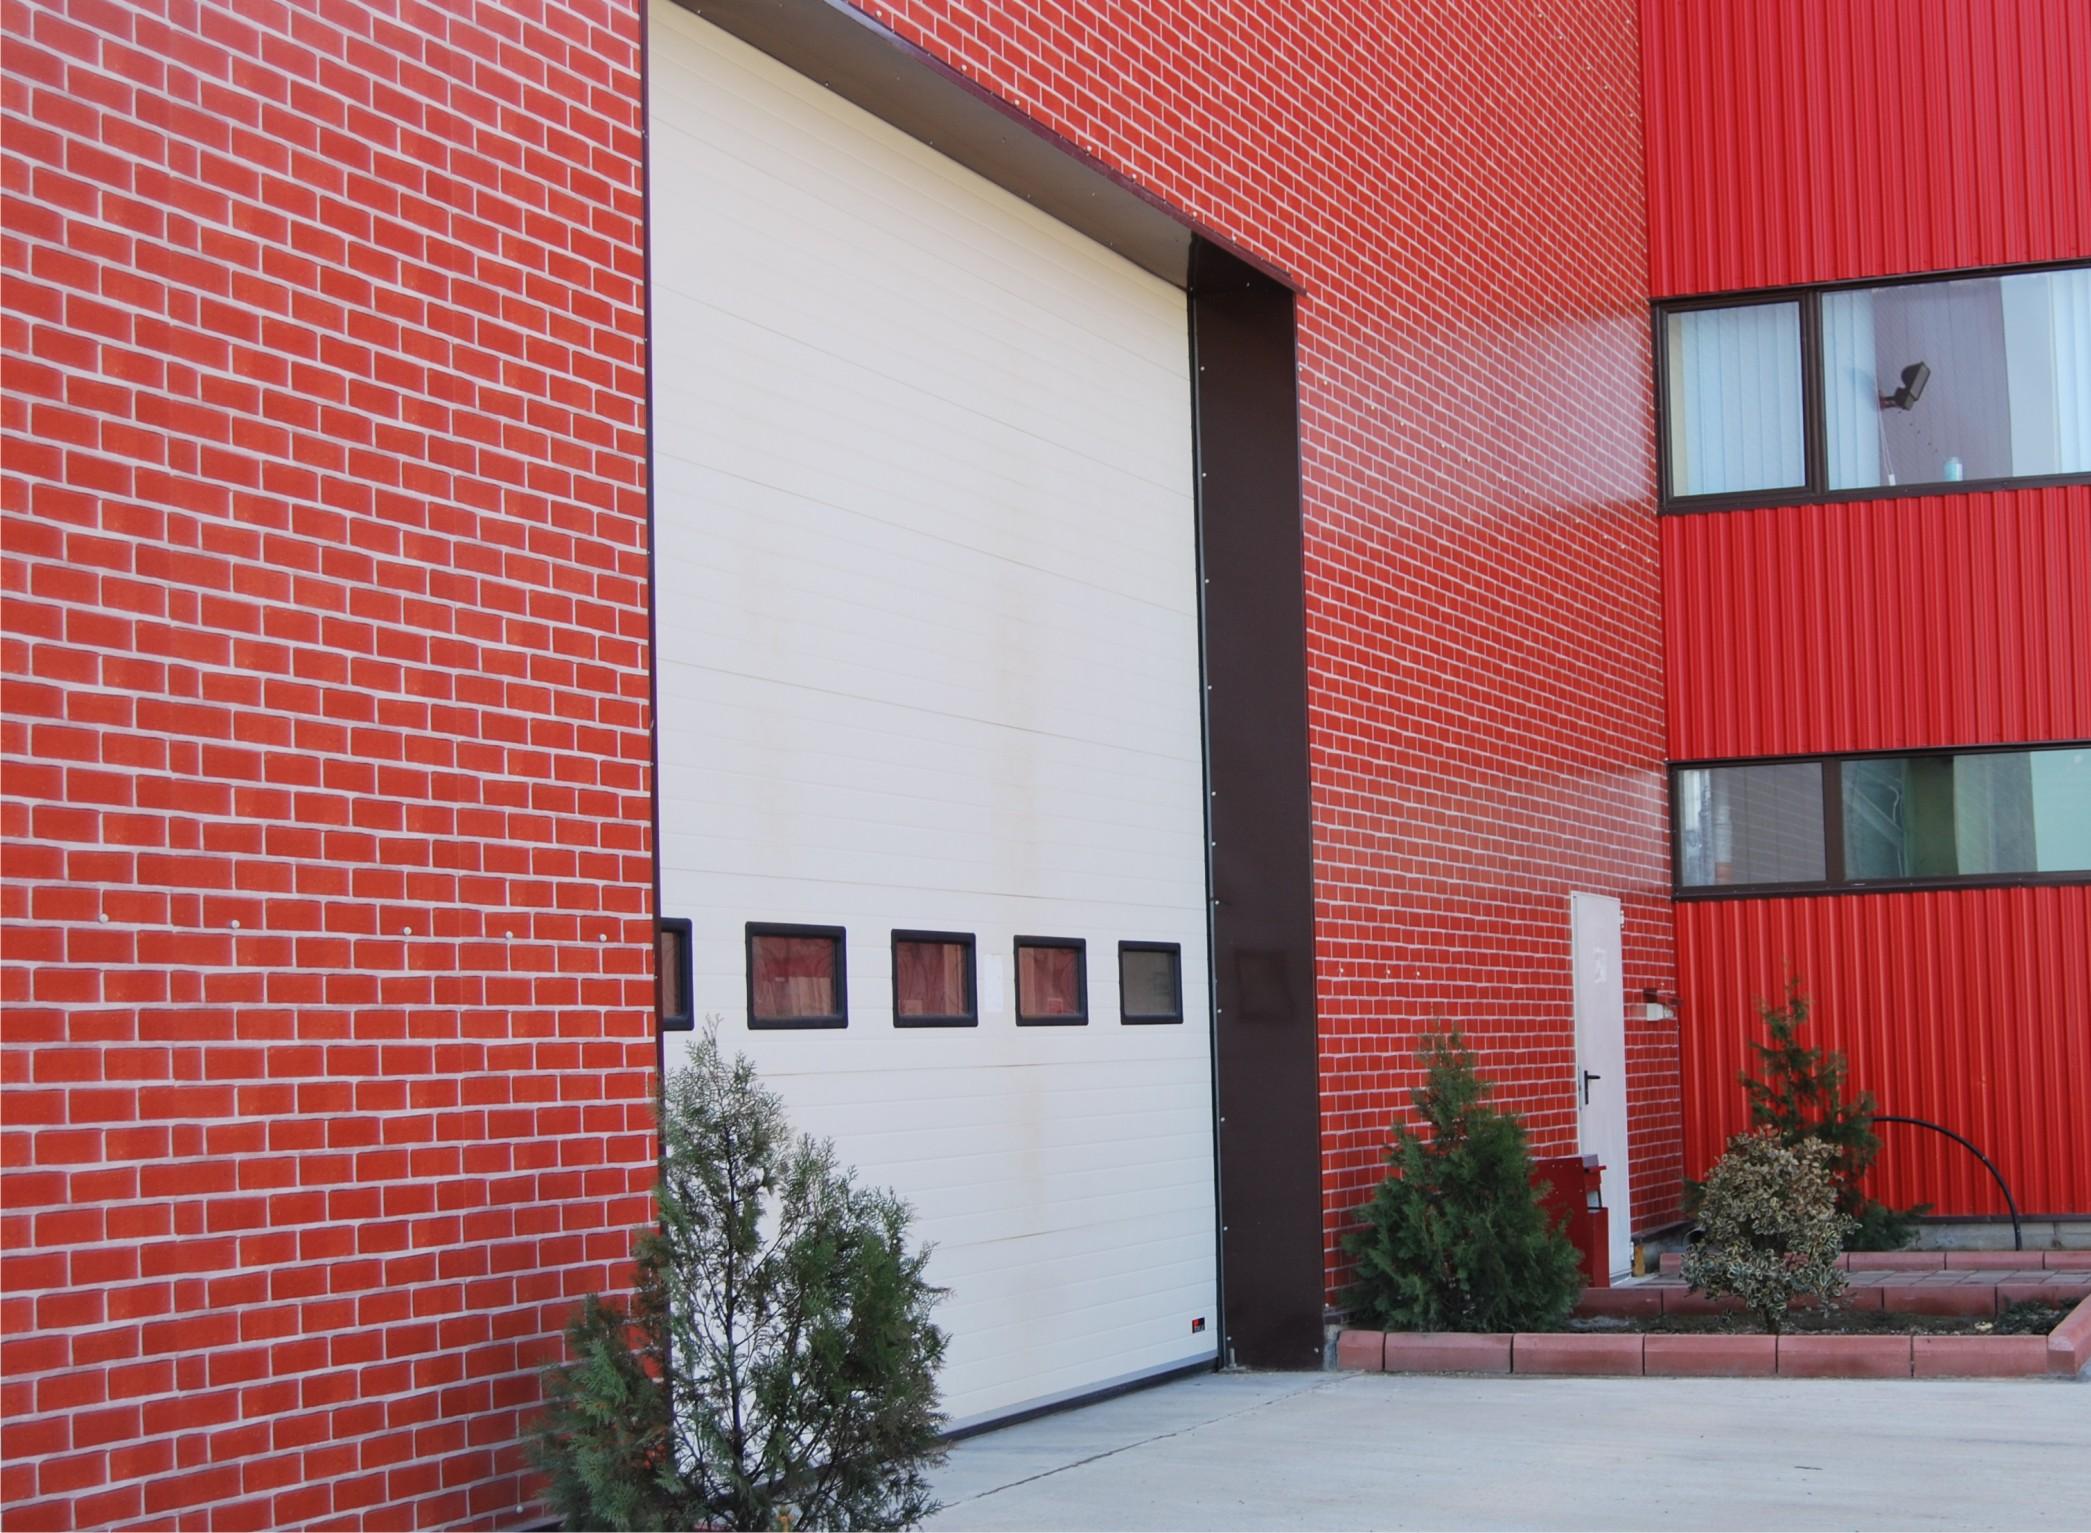 Tabla printata cutata multistrat pentru fatade, pereti si garduri  MIX FABRIK SYSTEM - Poza 1